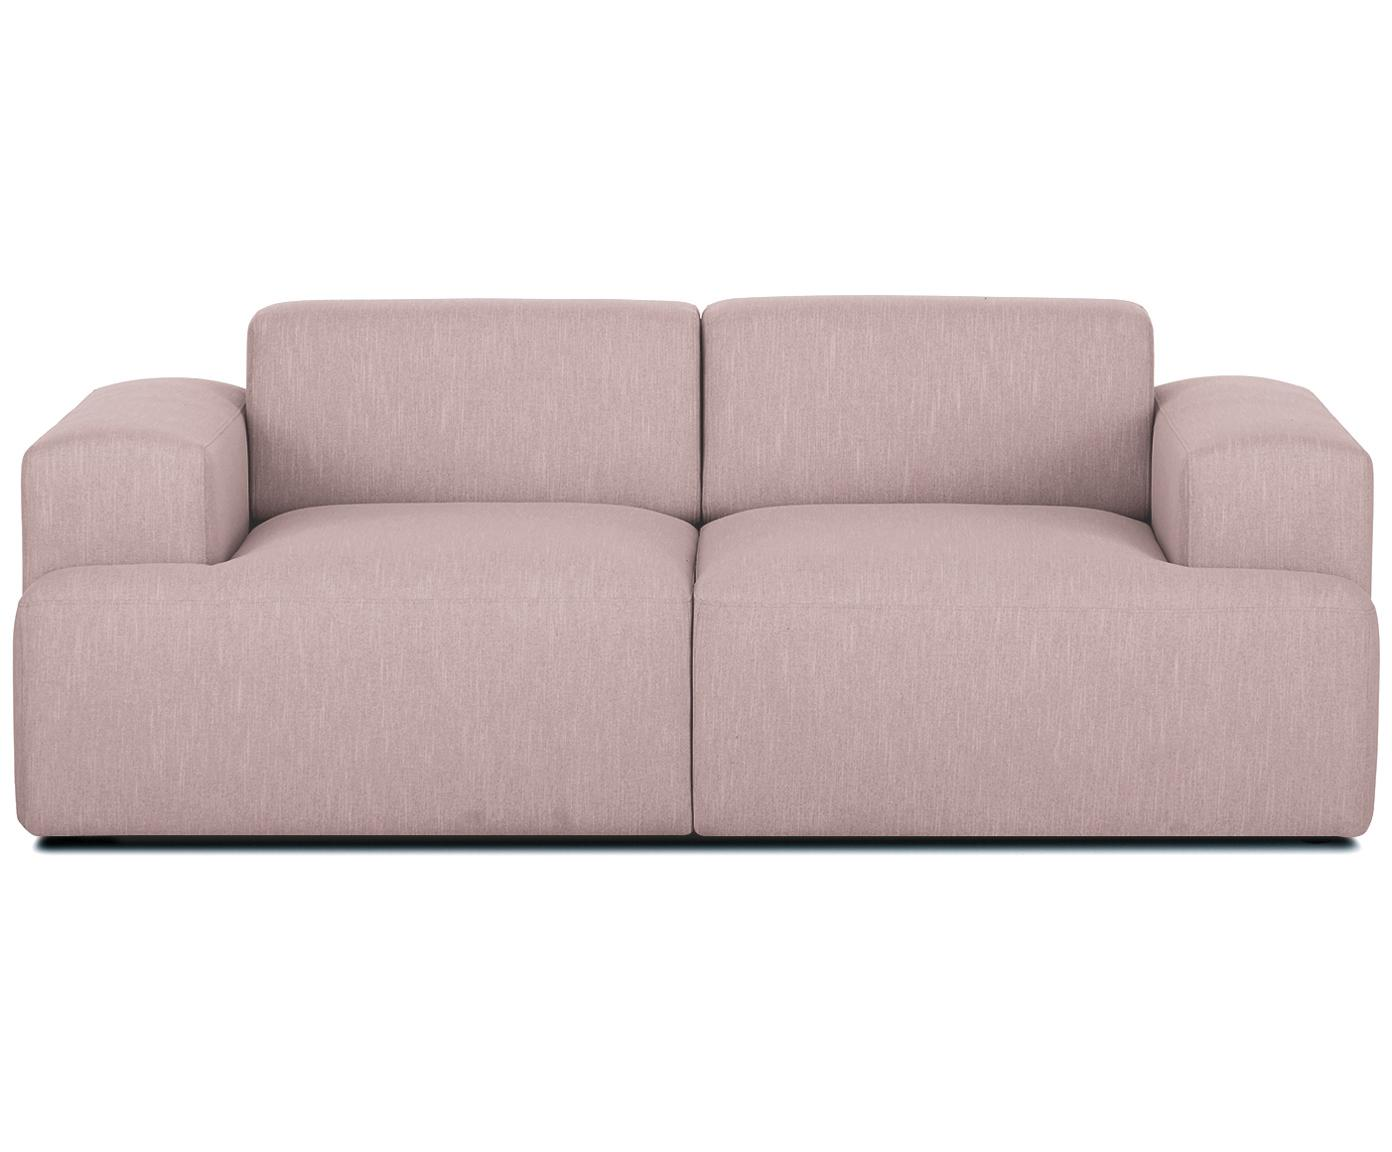 Bank Melva (2-zits), Bekleding: polyester, Frame: massief grenenhout, spaan, Poten: grenenhout, Geweven stof roze, B 200 x D 101 cm